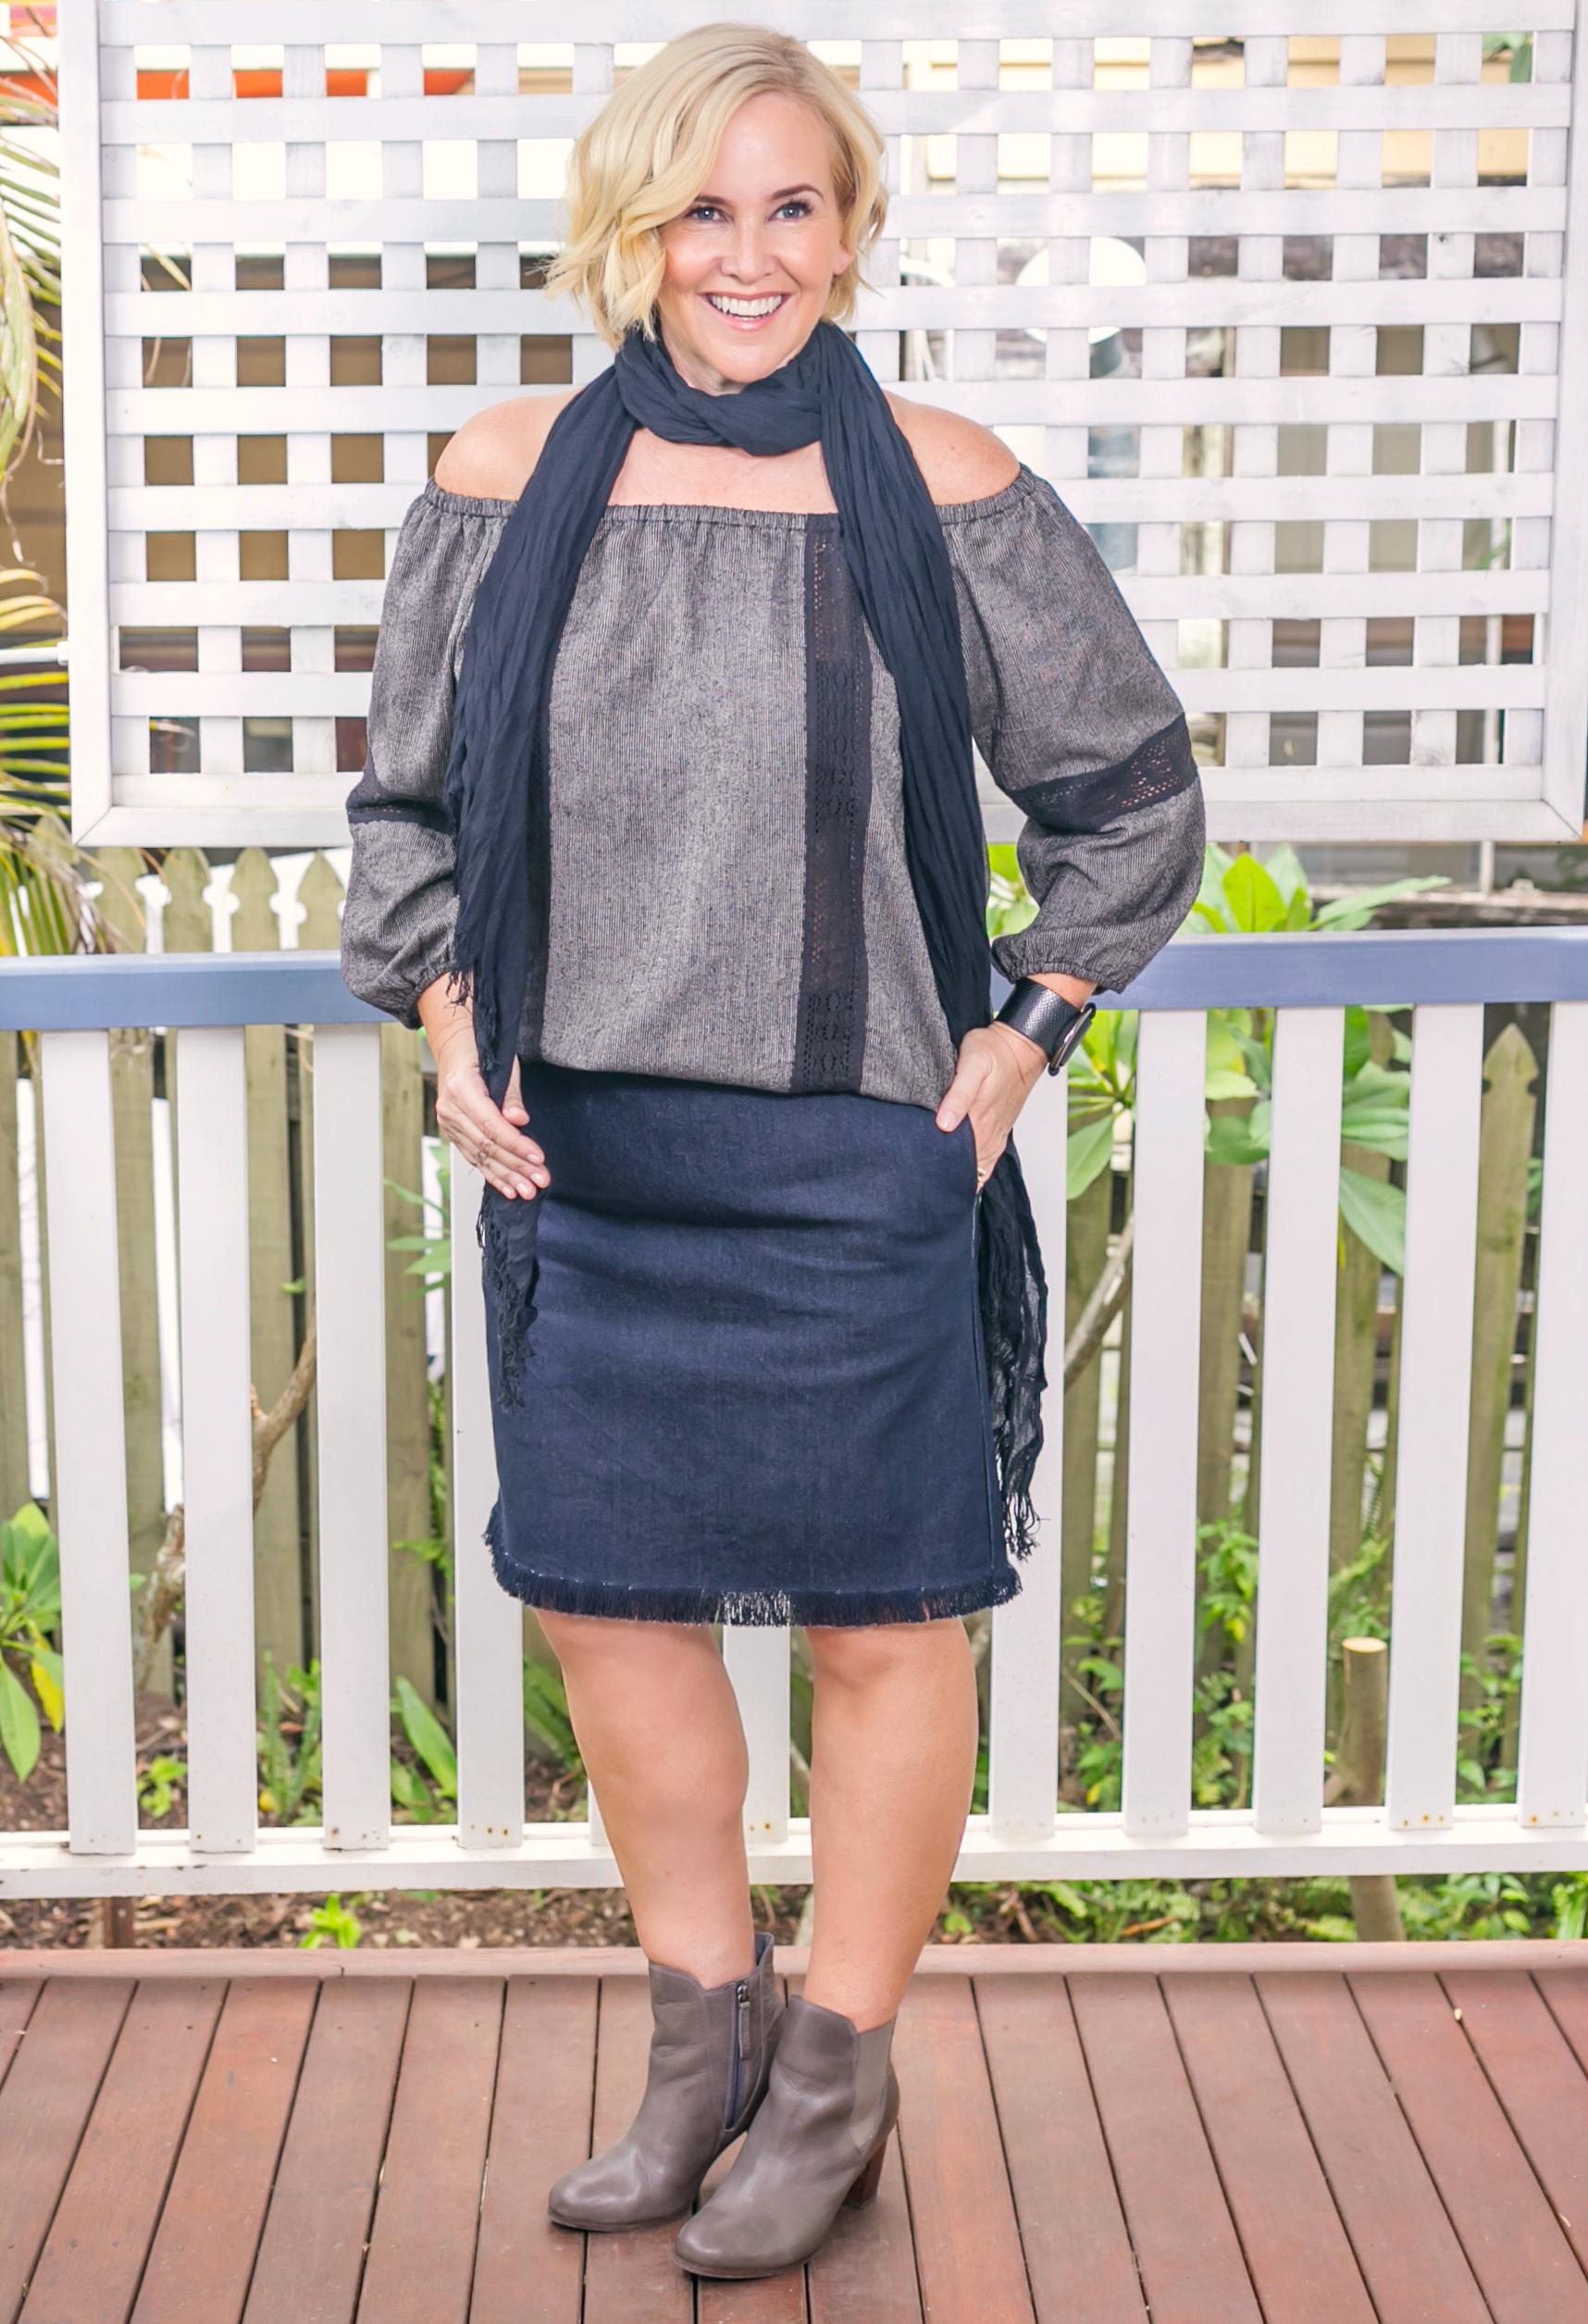 Adrift top and skirt | FRANKiE4 Footwear boots | Adorne cuff